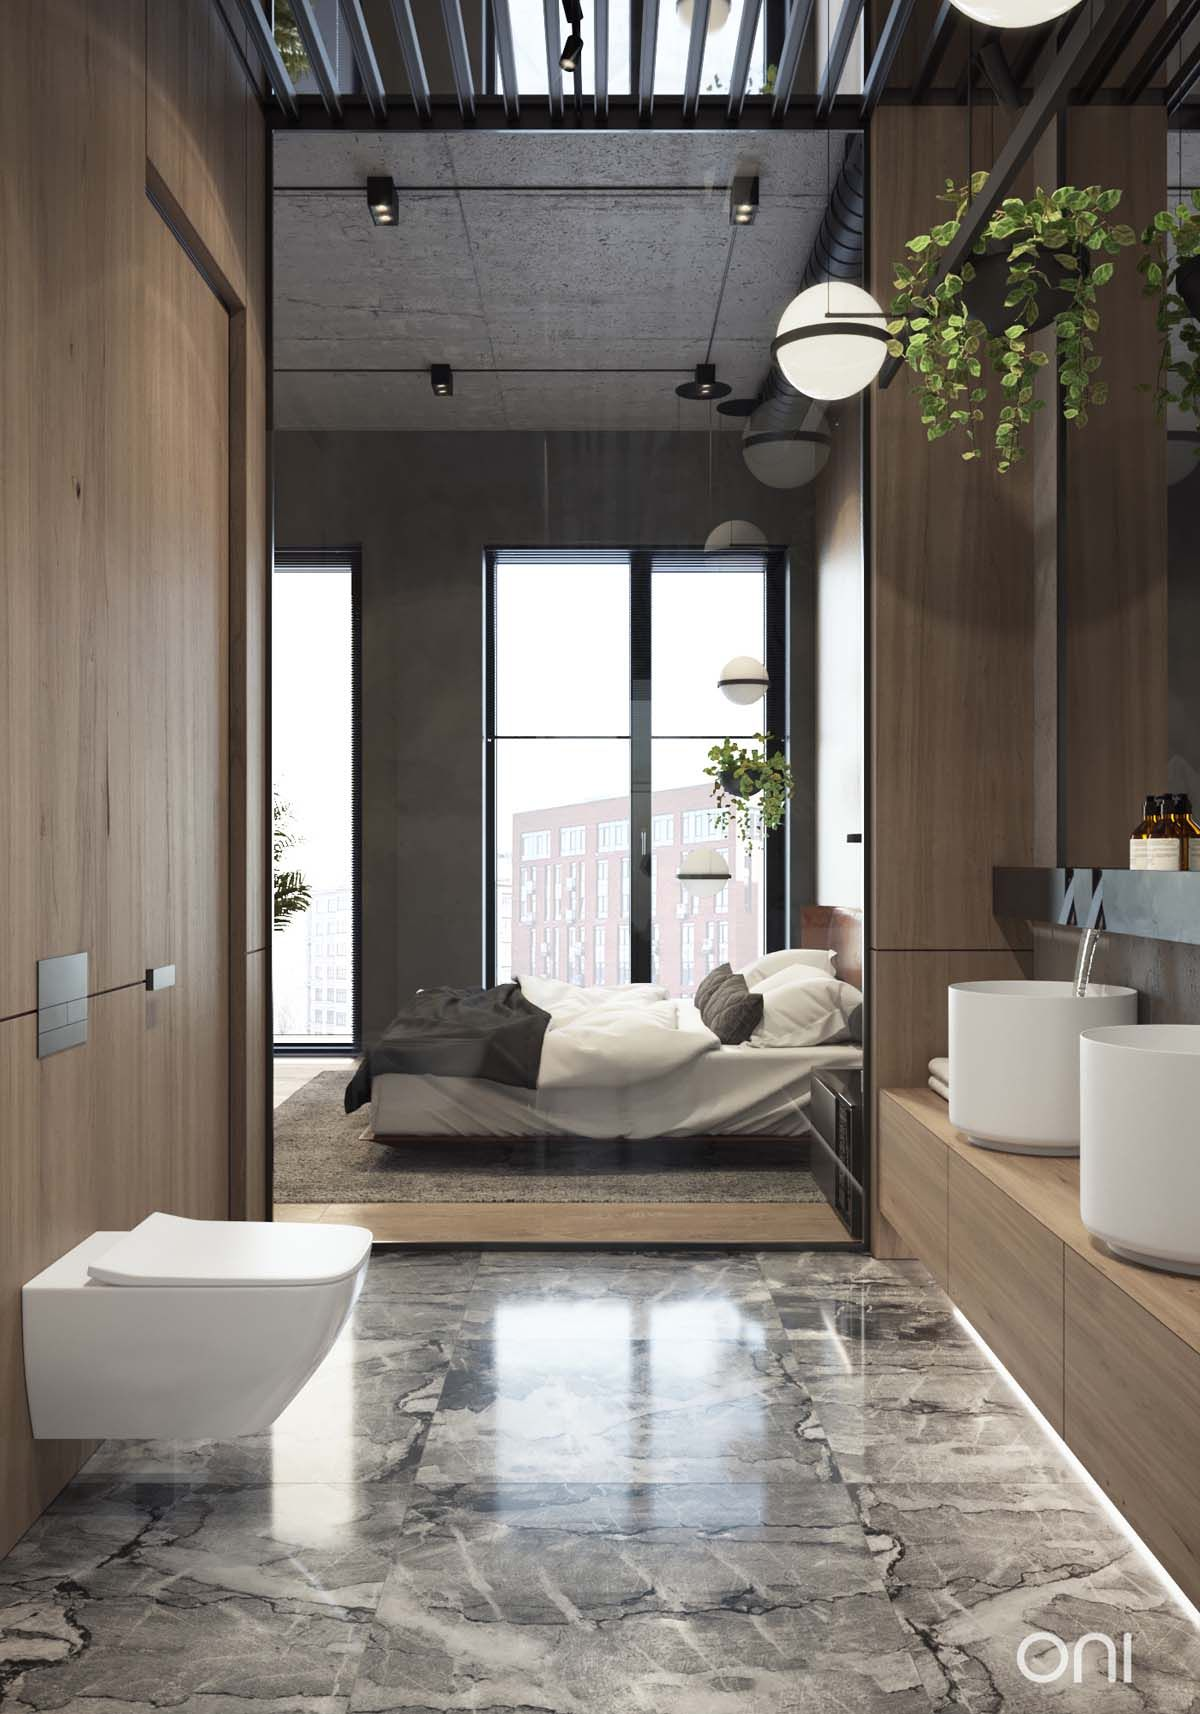 Loft bedroom with ensuite  Pin by Arwa Dawoud on Bathrooms  Pinterest  Interiors Bedrooms